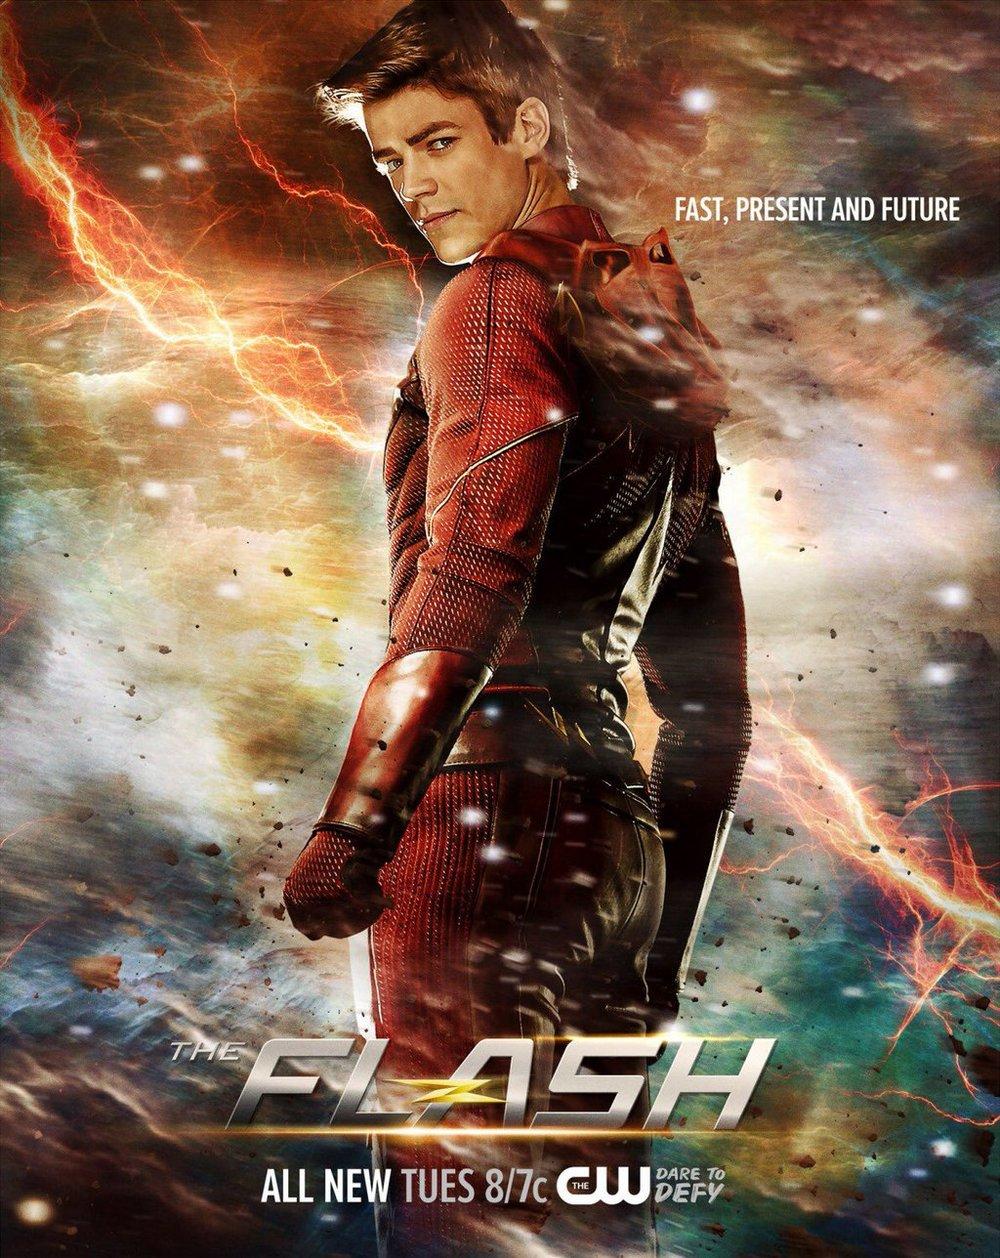 CW-The-Flash-Season-3-poster.jpg